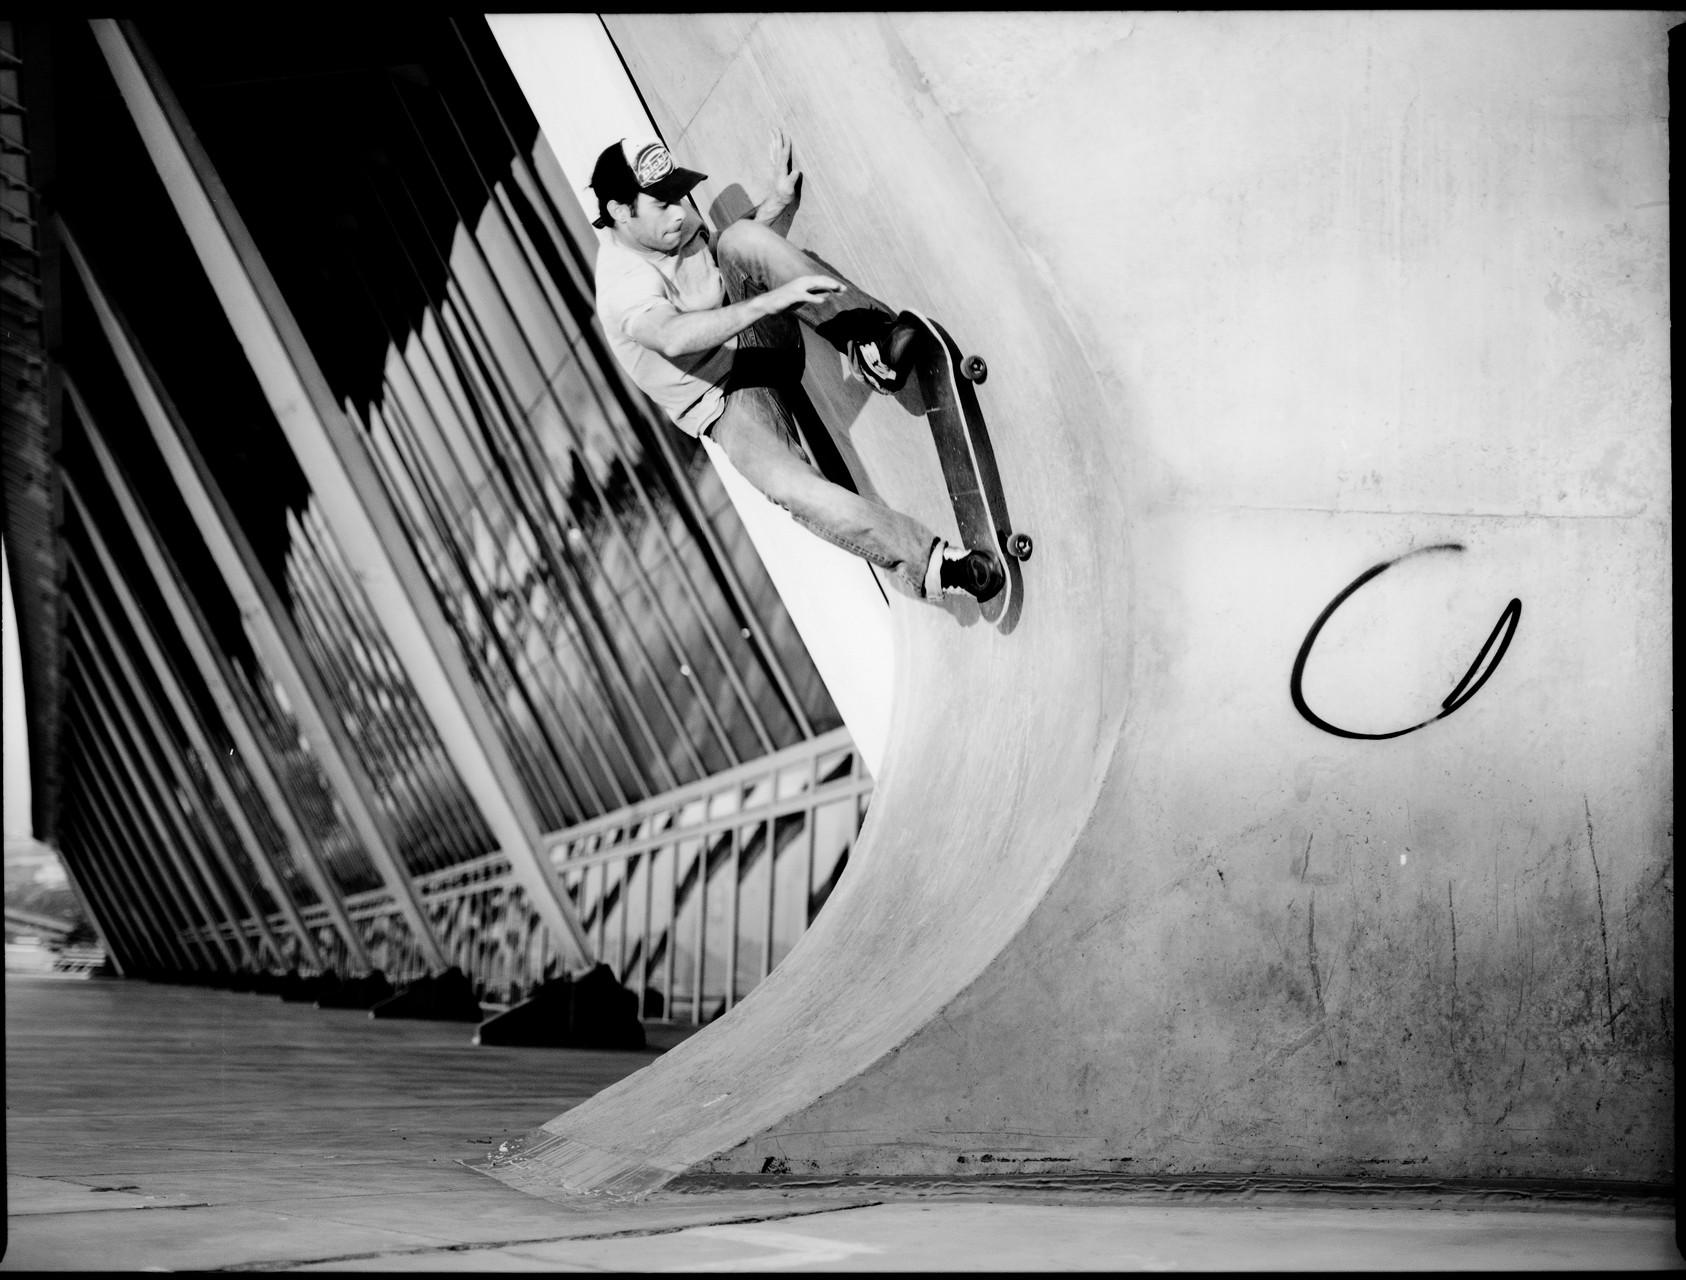 SKATE-STREET-PHOTOGRAPHY-34-JUANMI-MARQUEZ-1761x1280-1761x1280